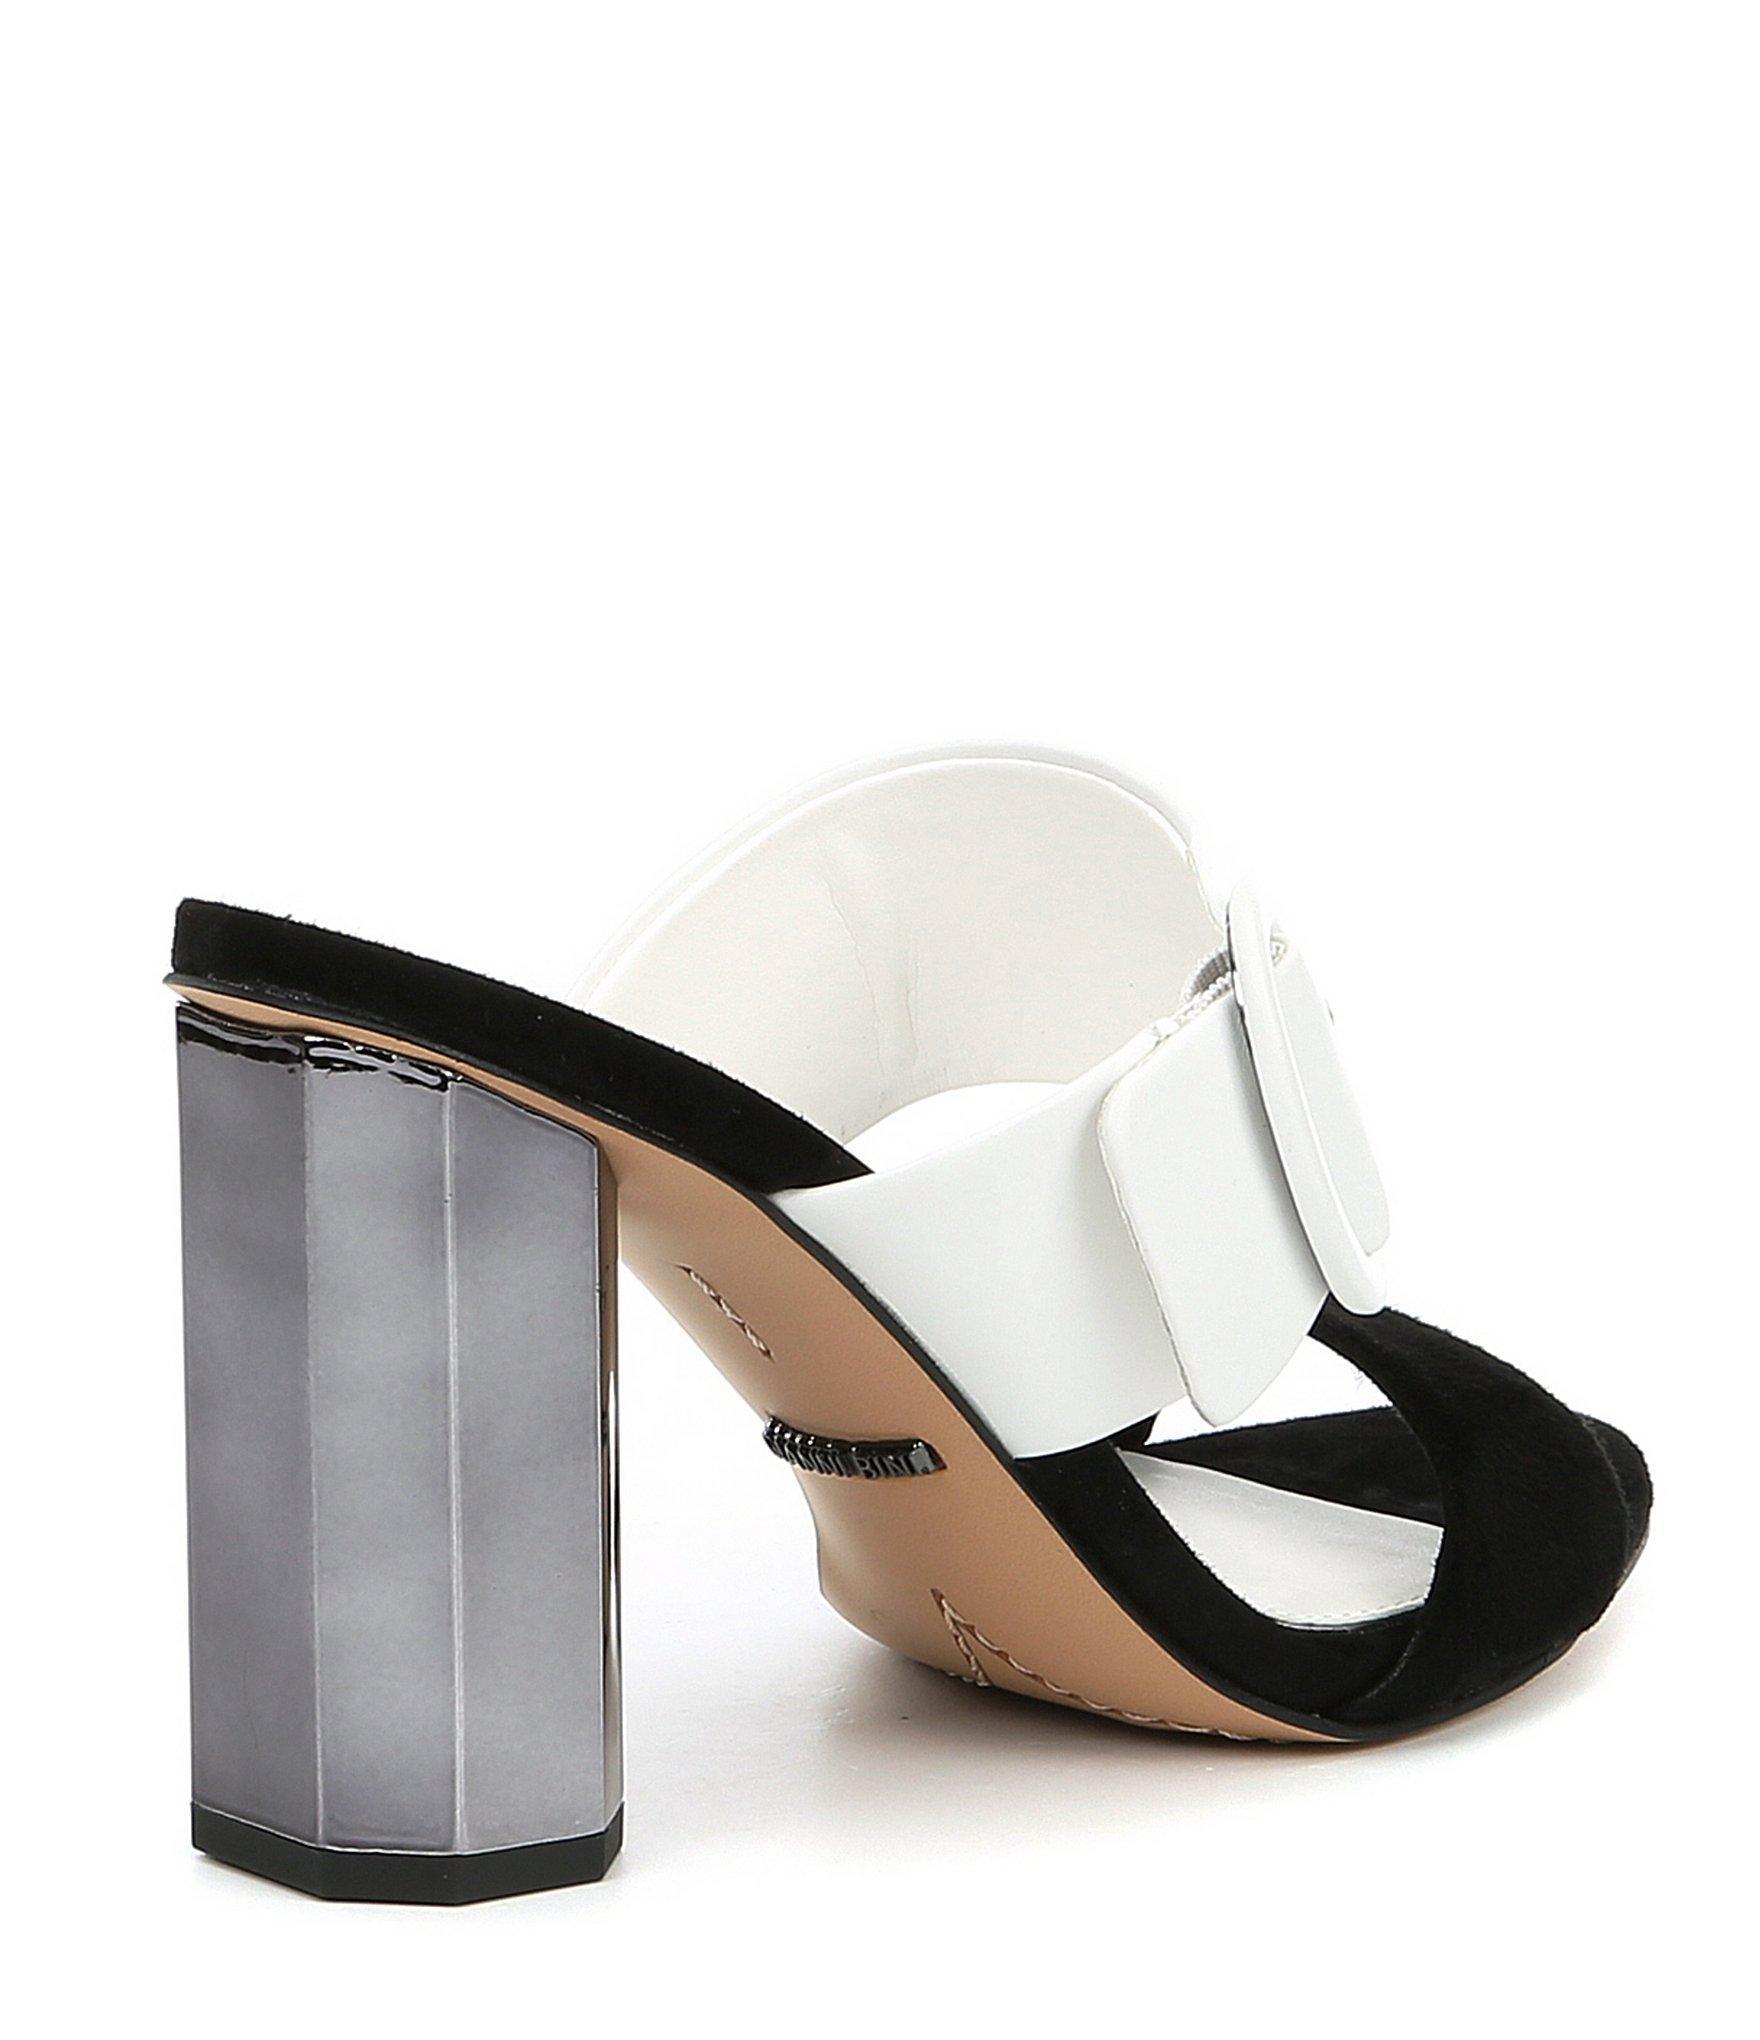 6ab97216ac4 Gianni Bini - Black Ramey Colorblock Block Heel Mules - Lyst. View  fullscreen